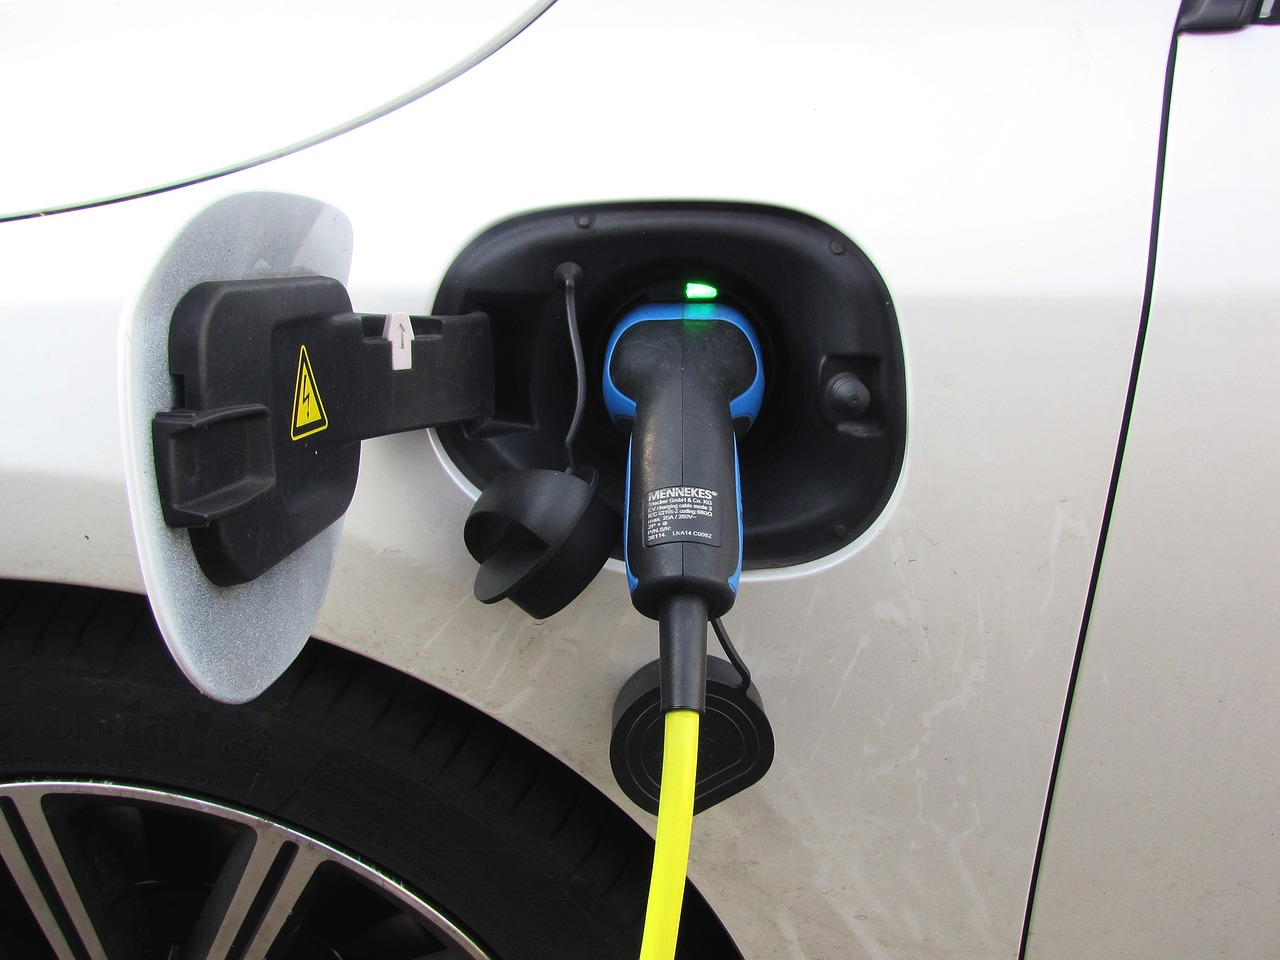 coches eléctricos segunda mano Milanuncios